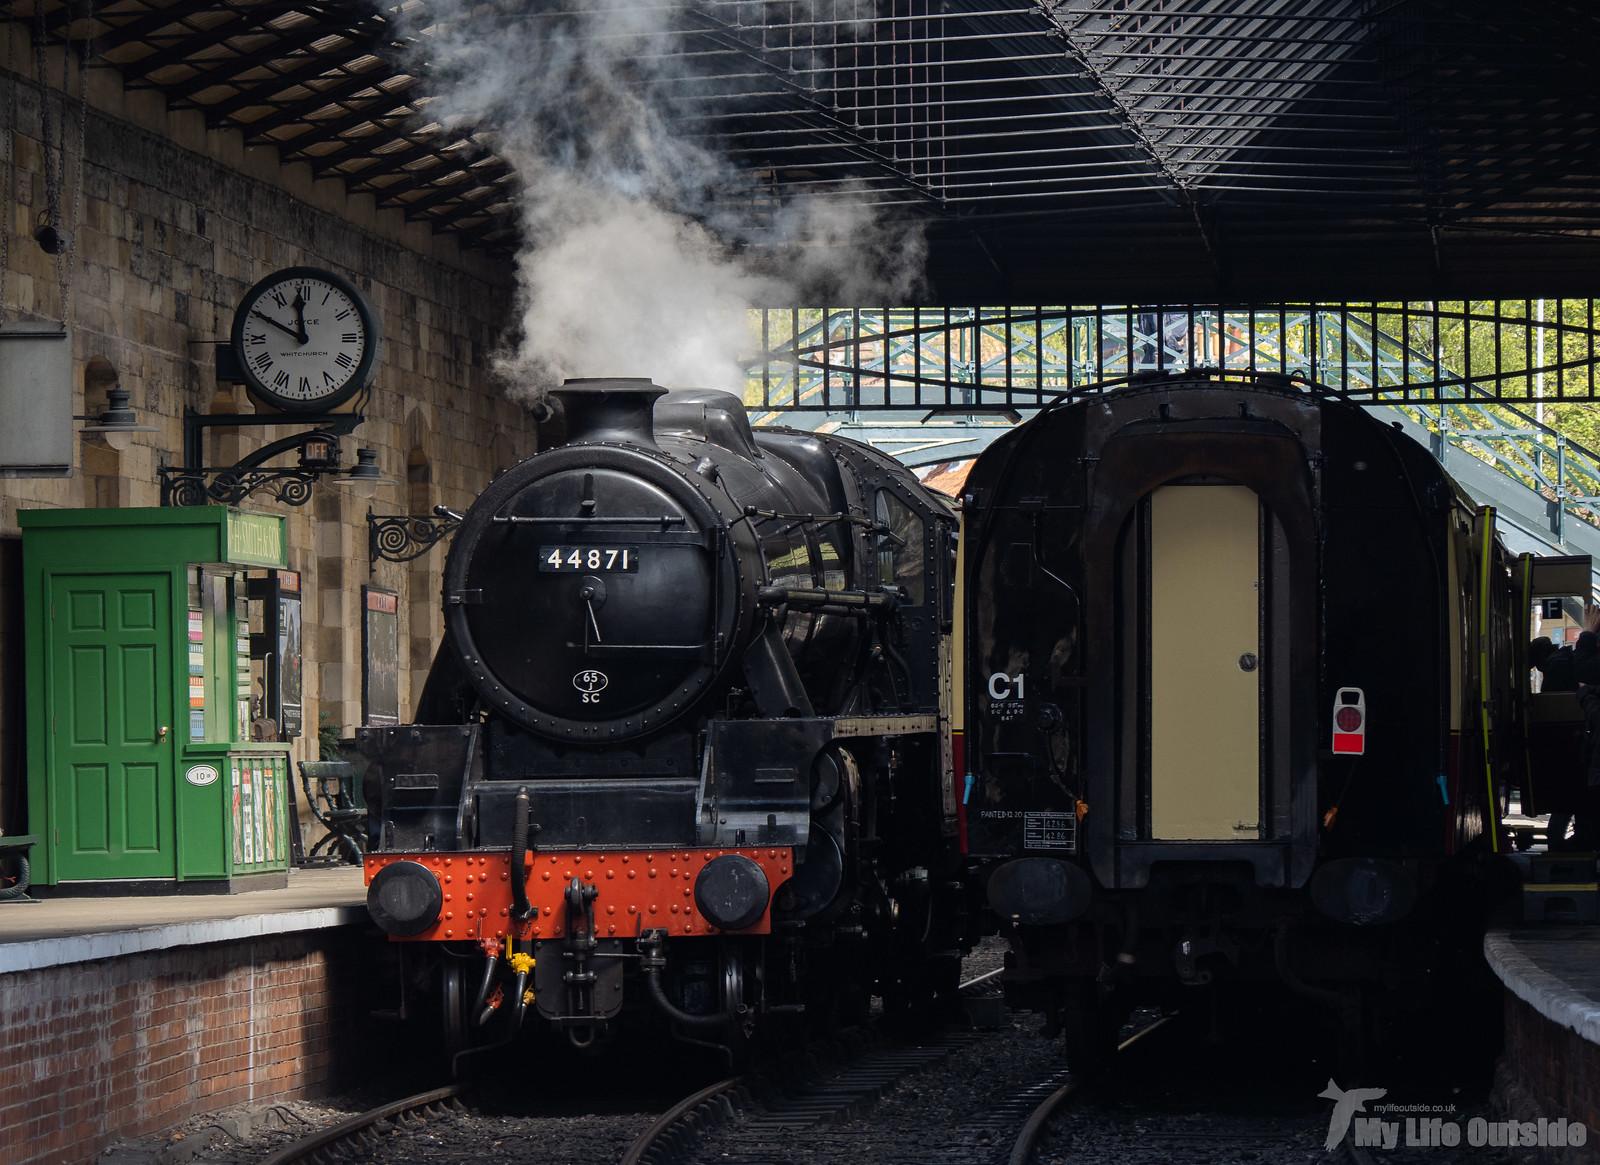 P5172198 - North York Moors Railway